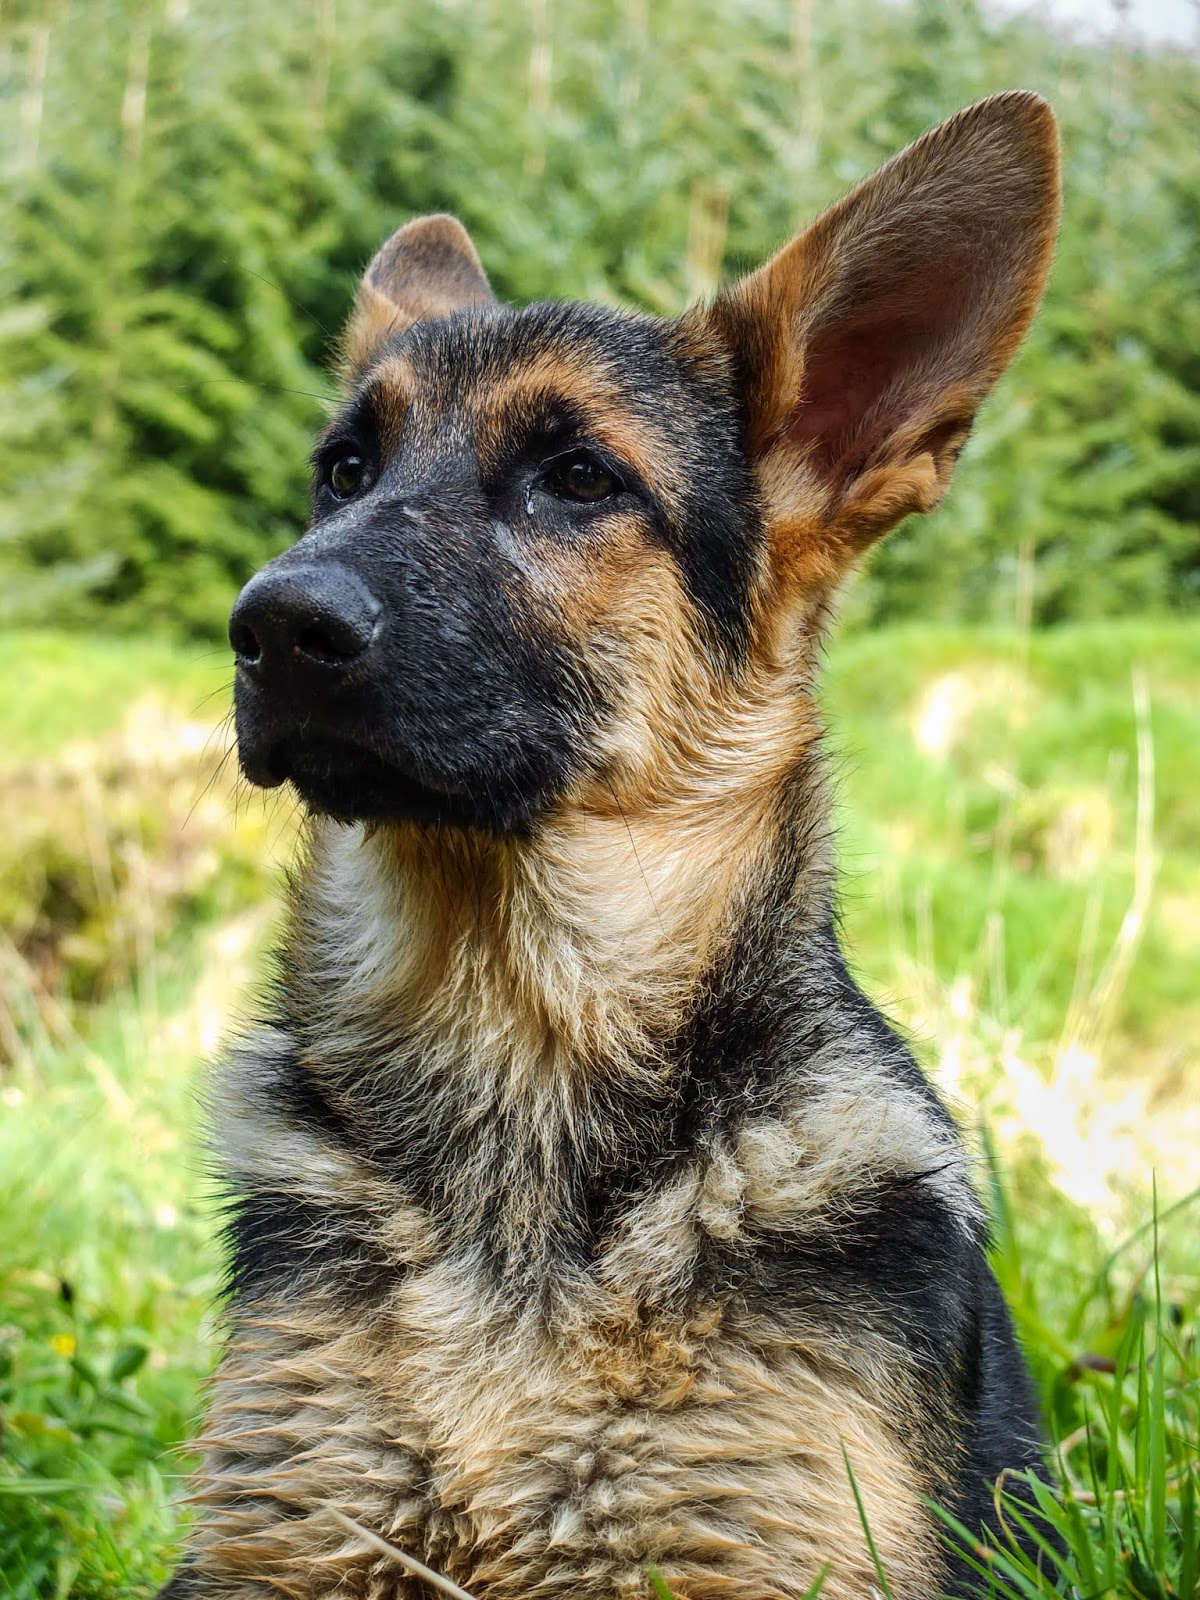 A German Shepherd pup Nala sitting with her head high and ears back.